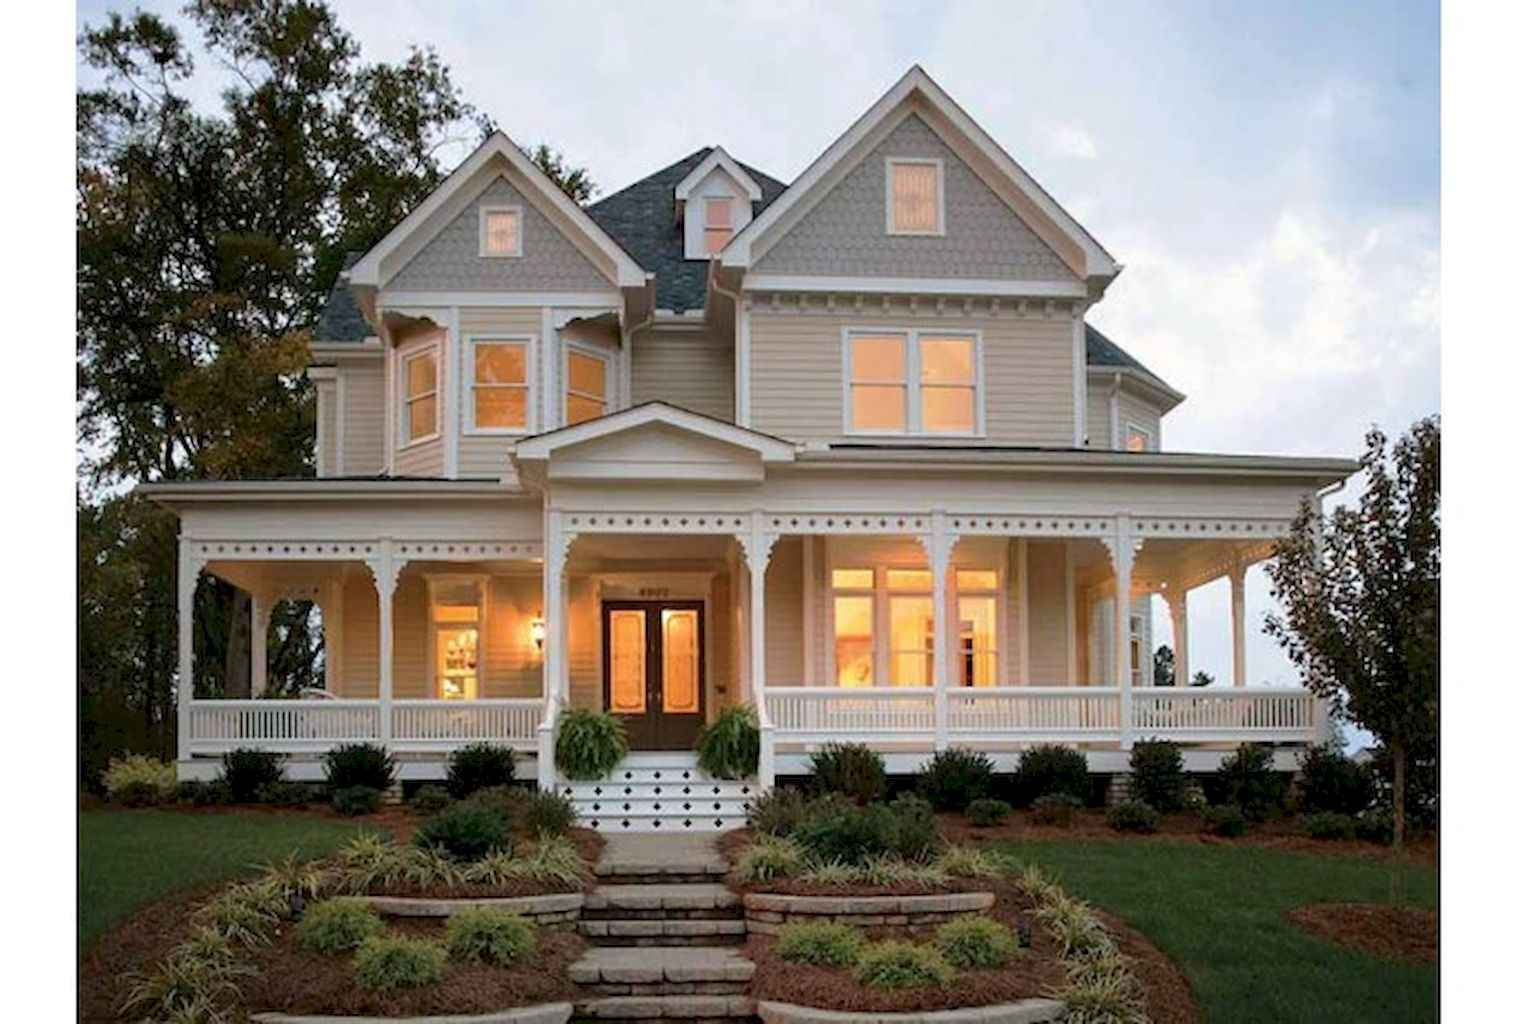 80 awesome victorian farmhouse plans design ideas (49)